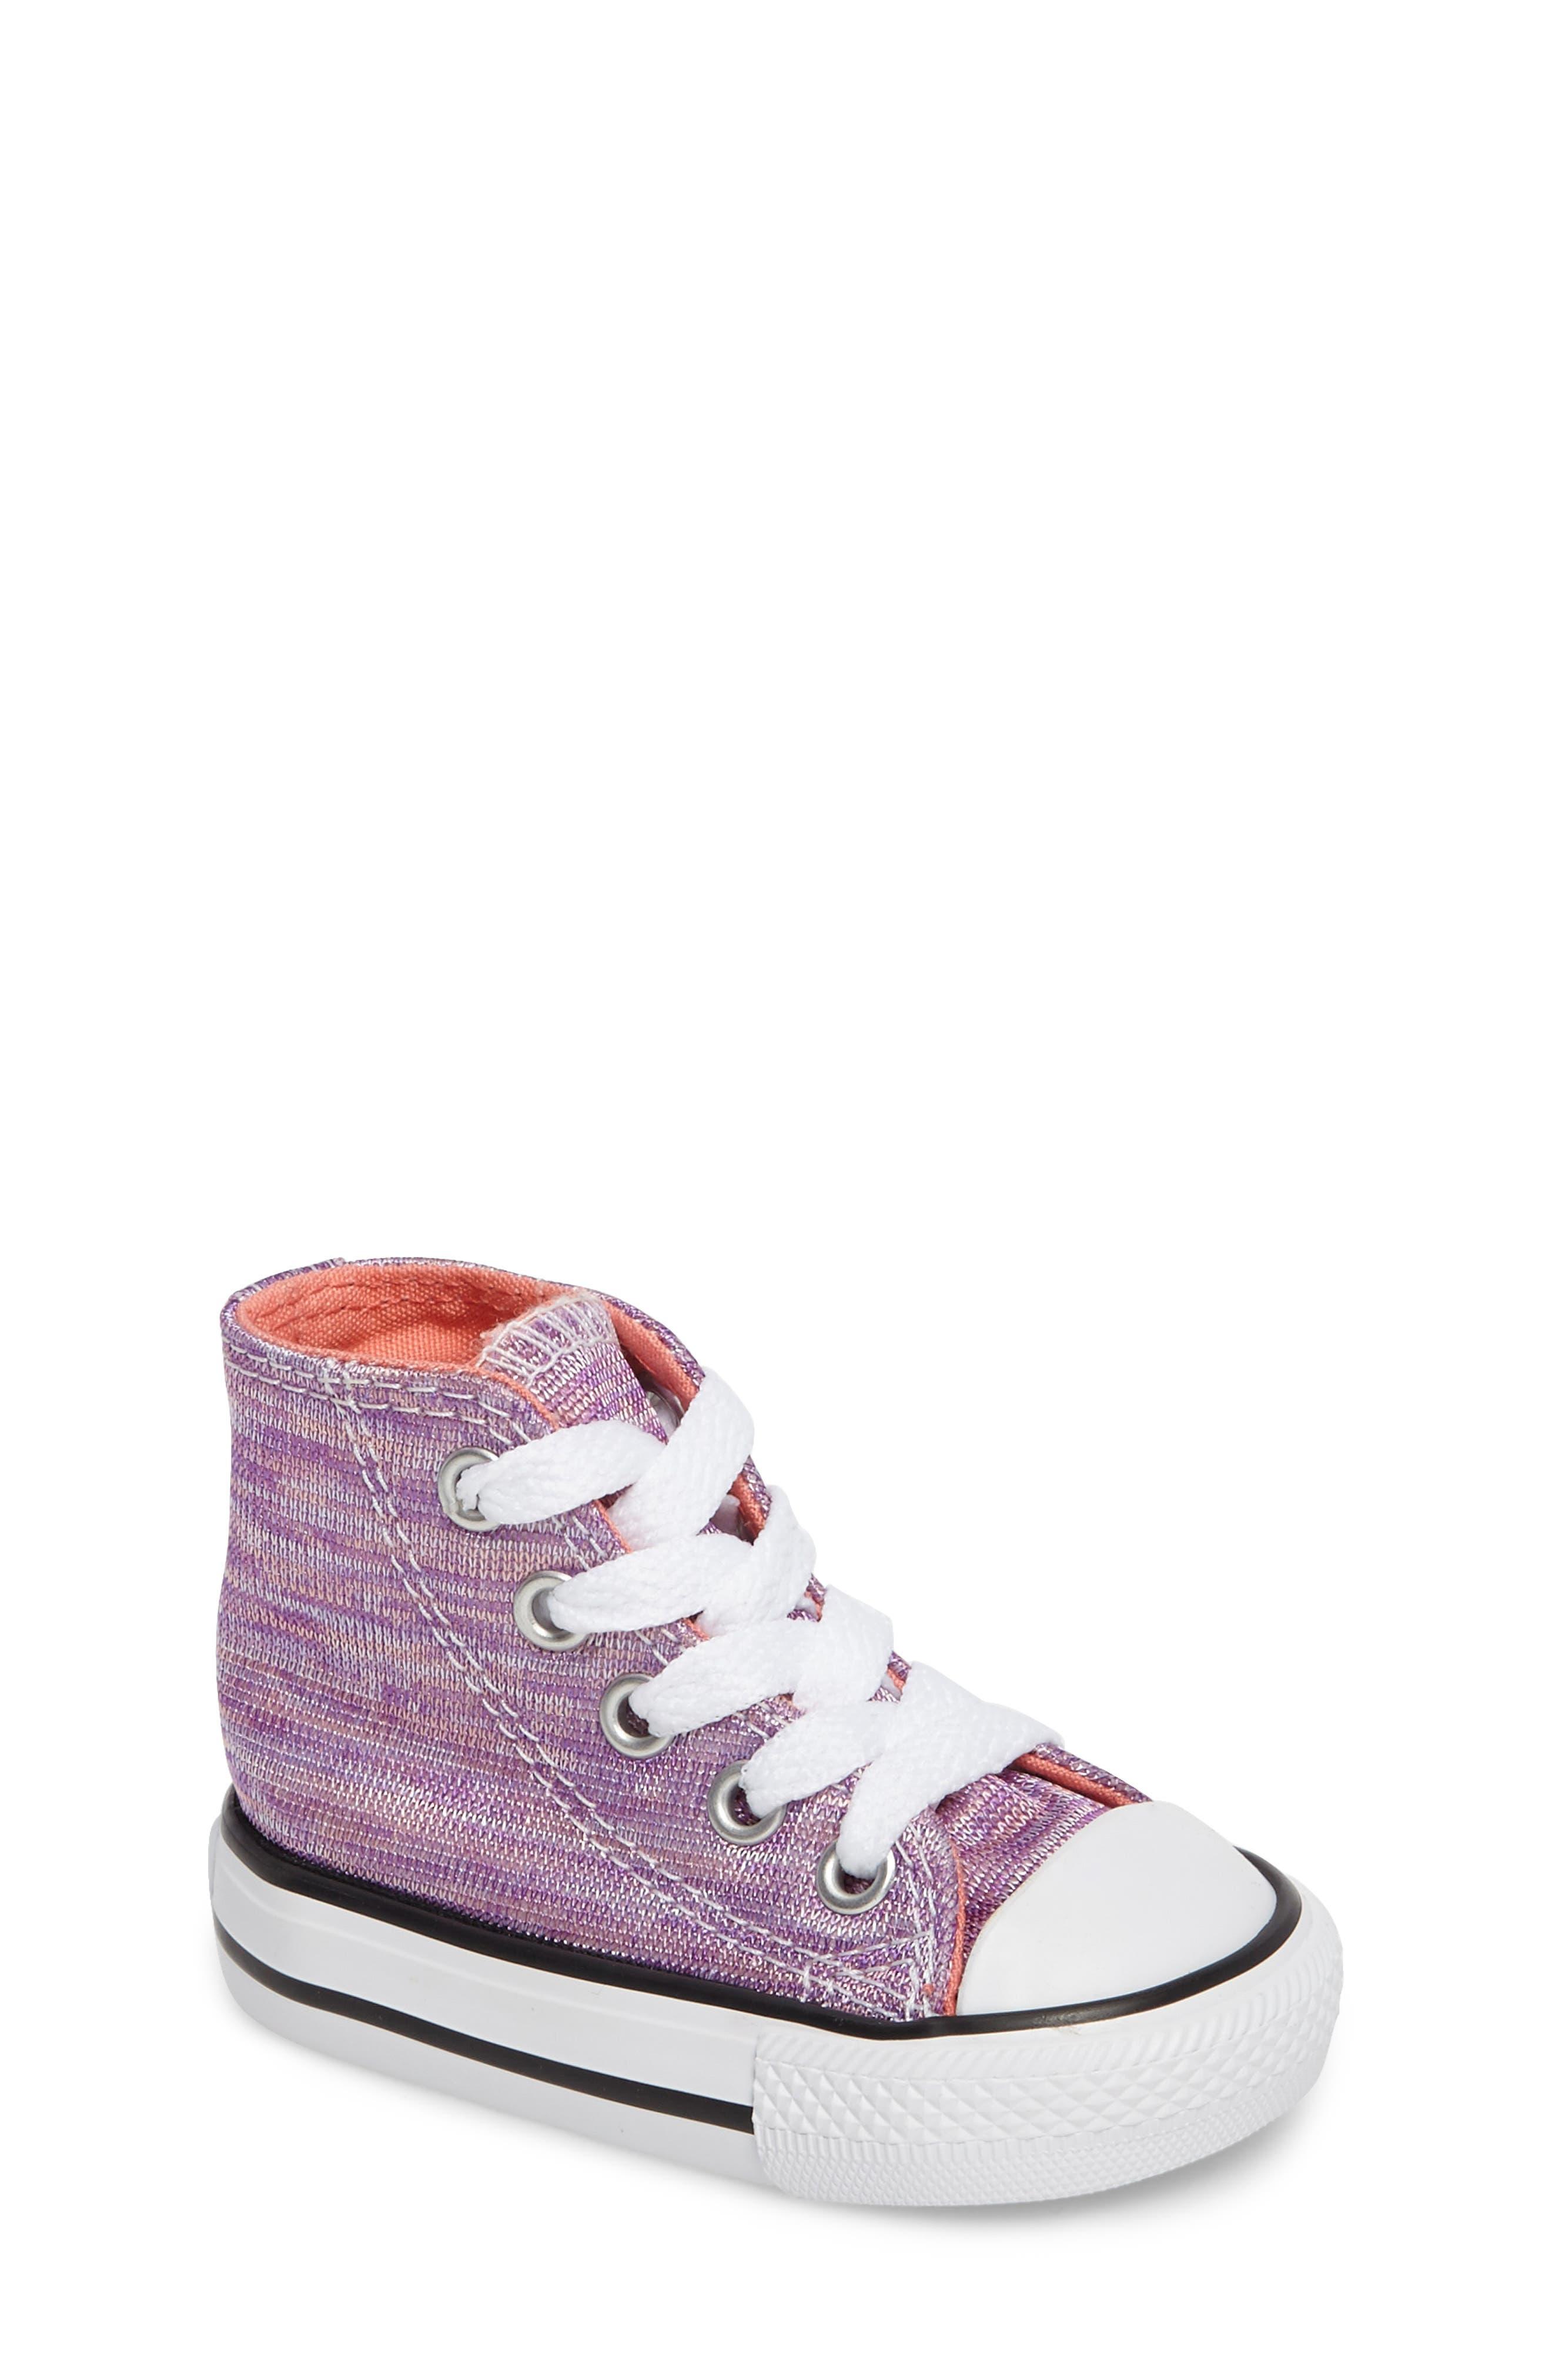 Converse Chuck Taylor® All Star® Knit High Top Sneaker (Baby, Walker, Toddler & Little Kid)